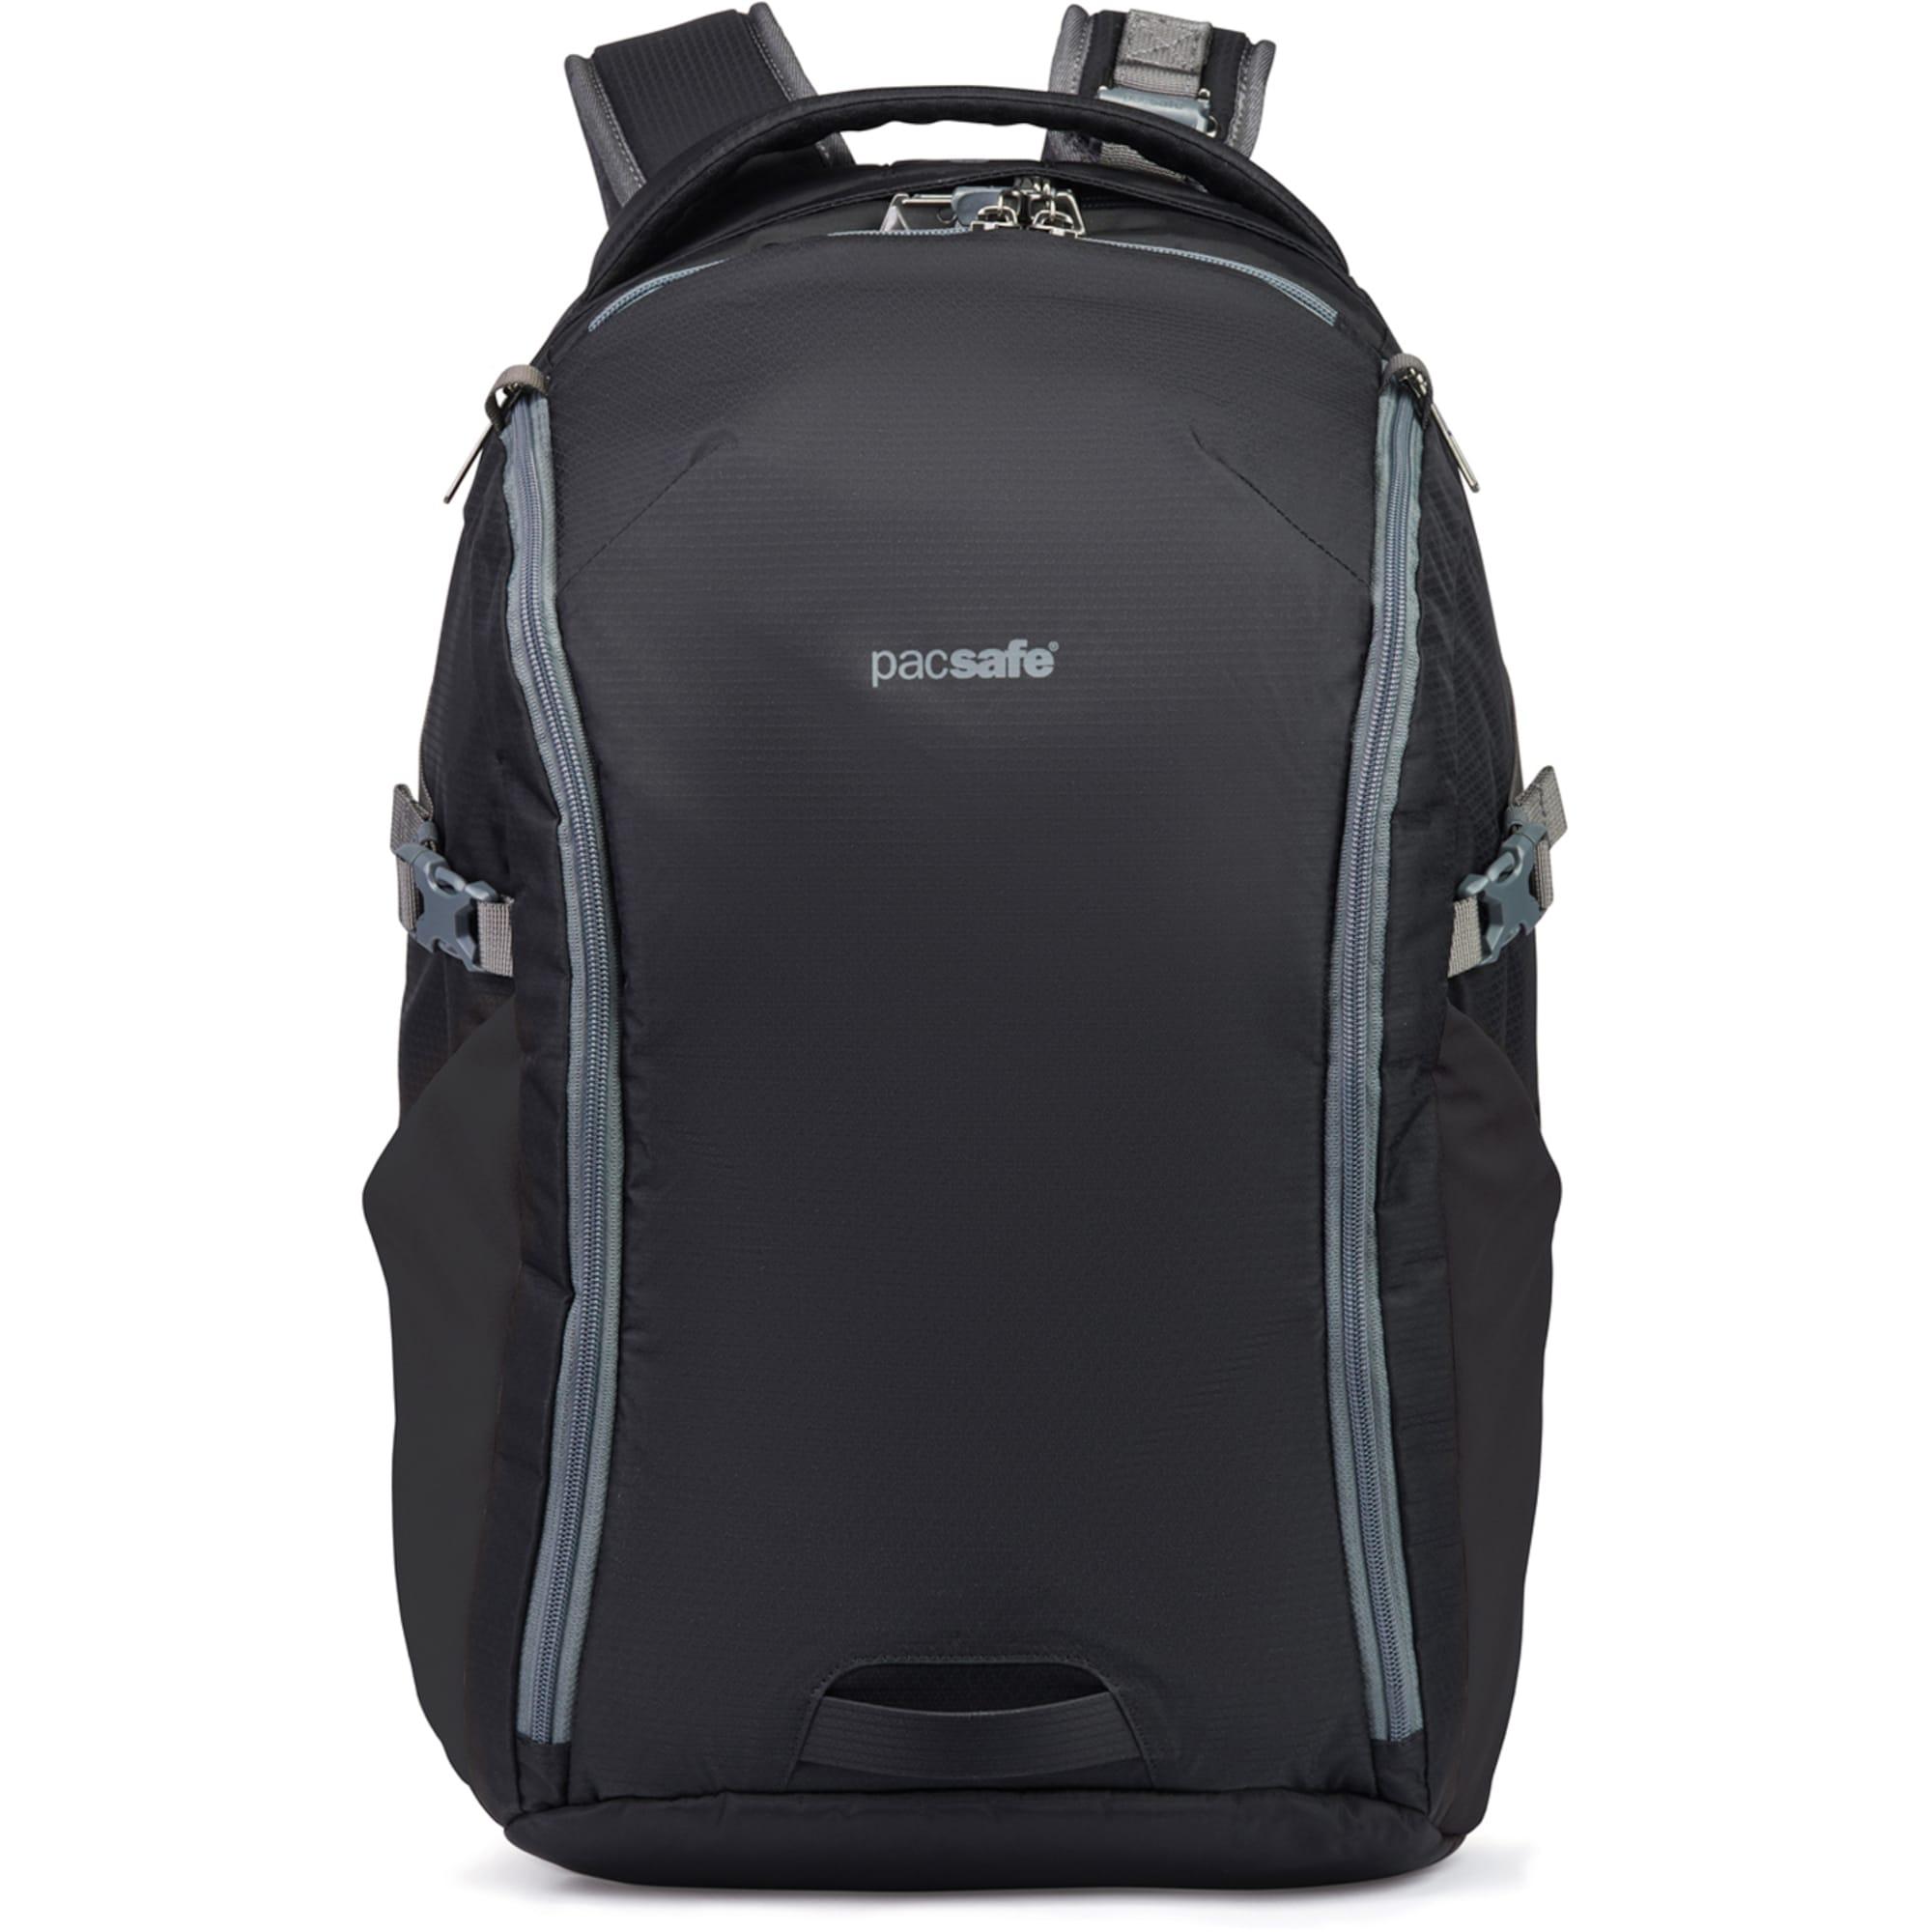 Rucksack | Taschen > Rucksäcke | Pacsafe